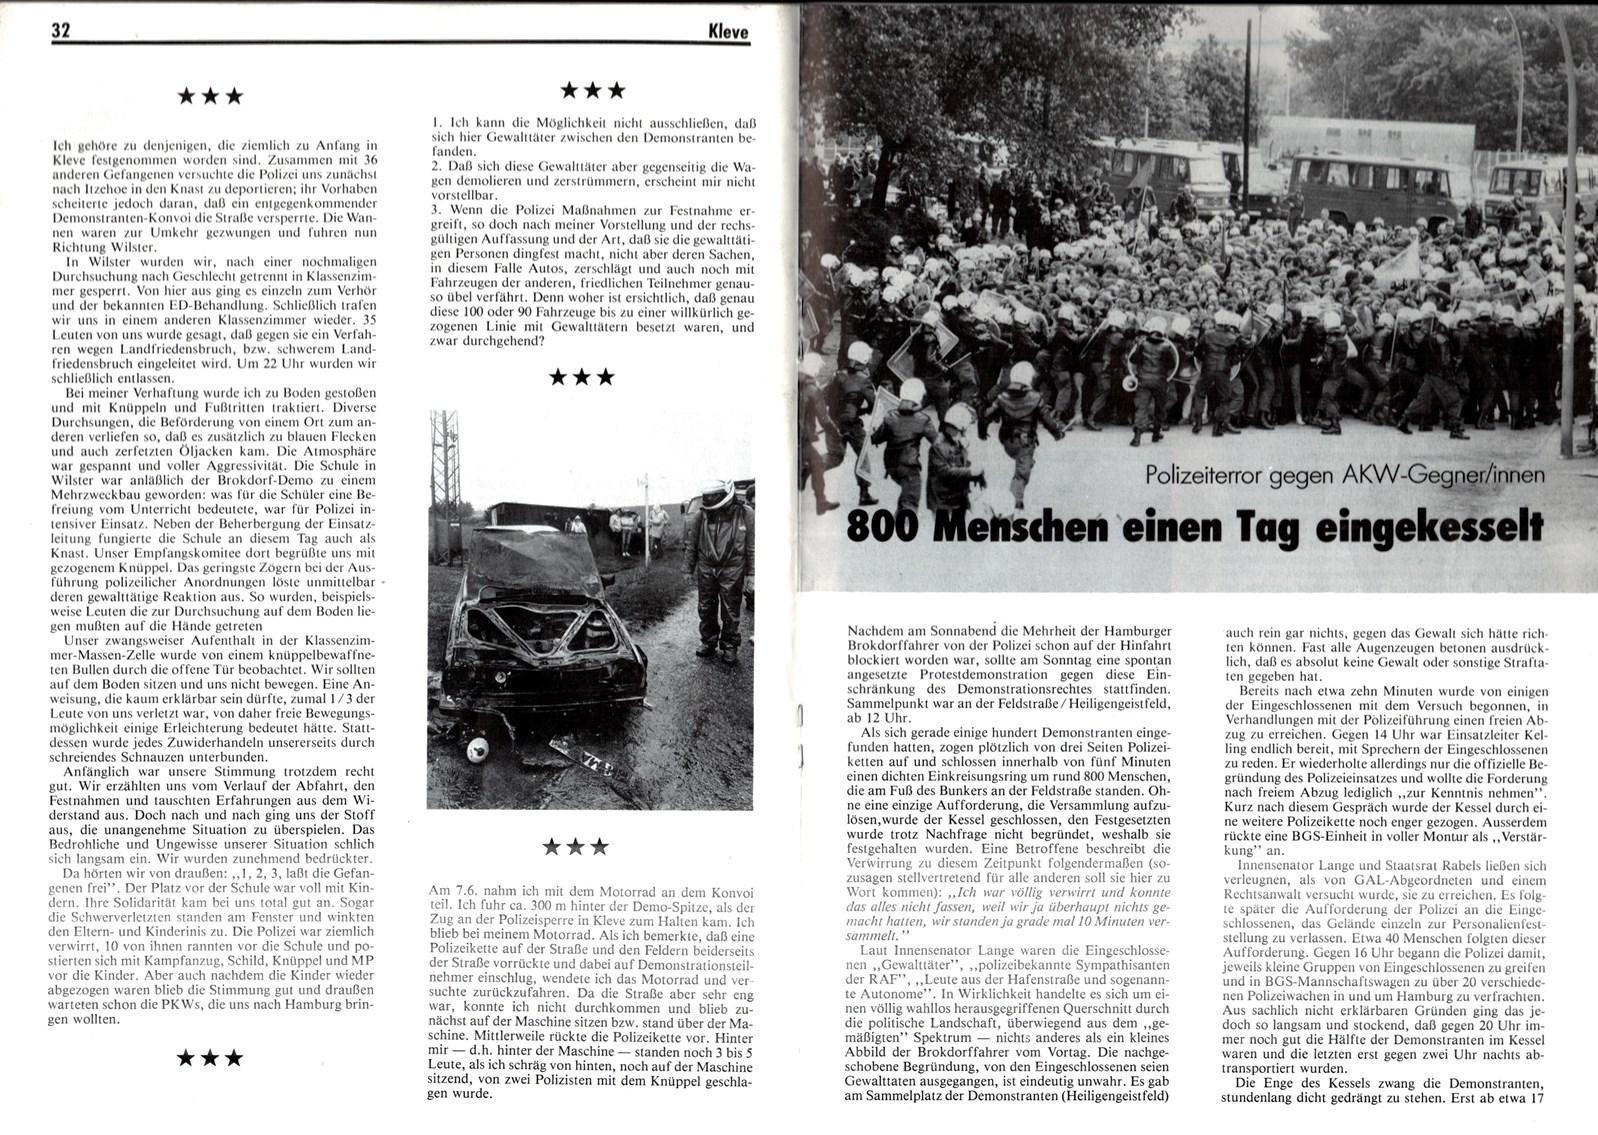 NOR_AKW_1986_Brokdorf_Kleve_Hamburg_017